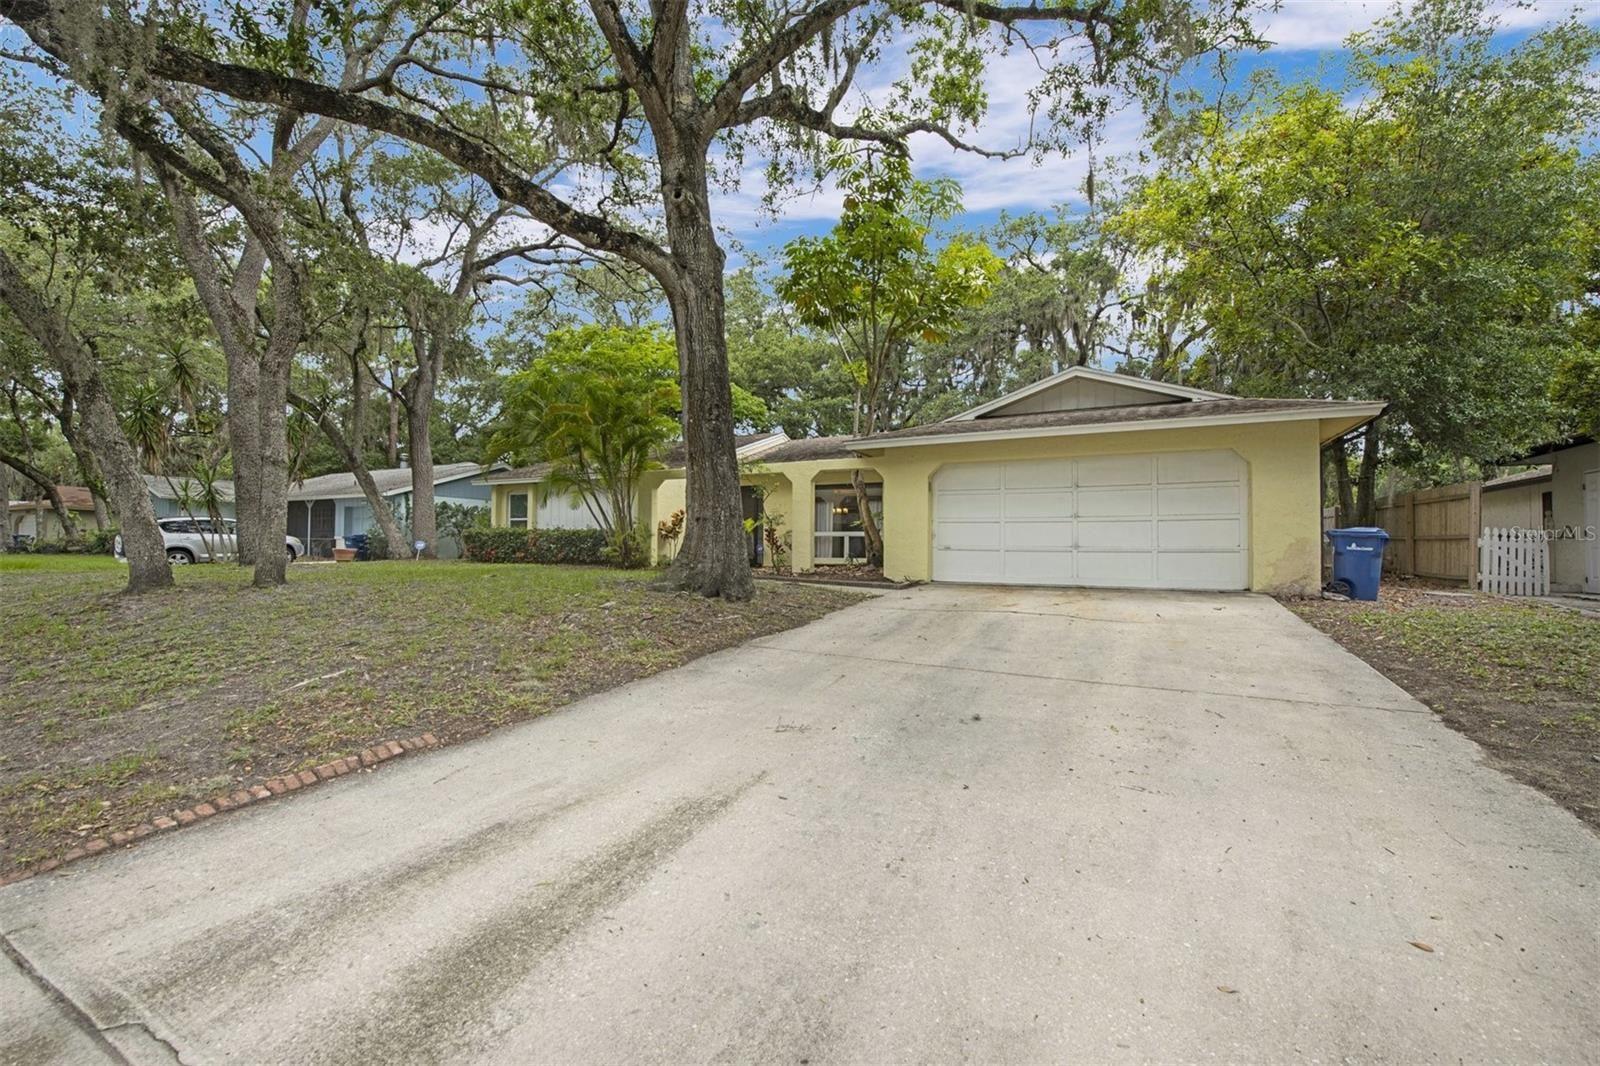 Photo of 5535 DUNCANWOOD PLACE, SARASOTA, FL 34232 (MLS # A4503594)